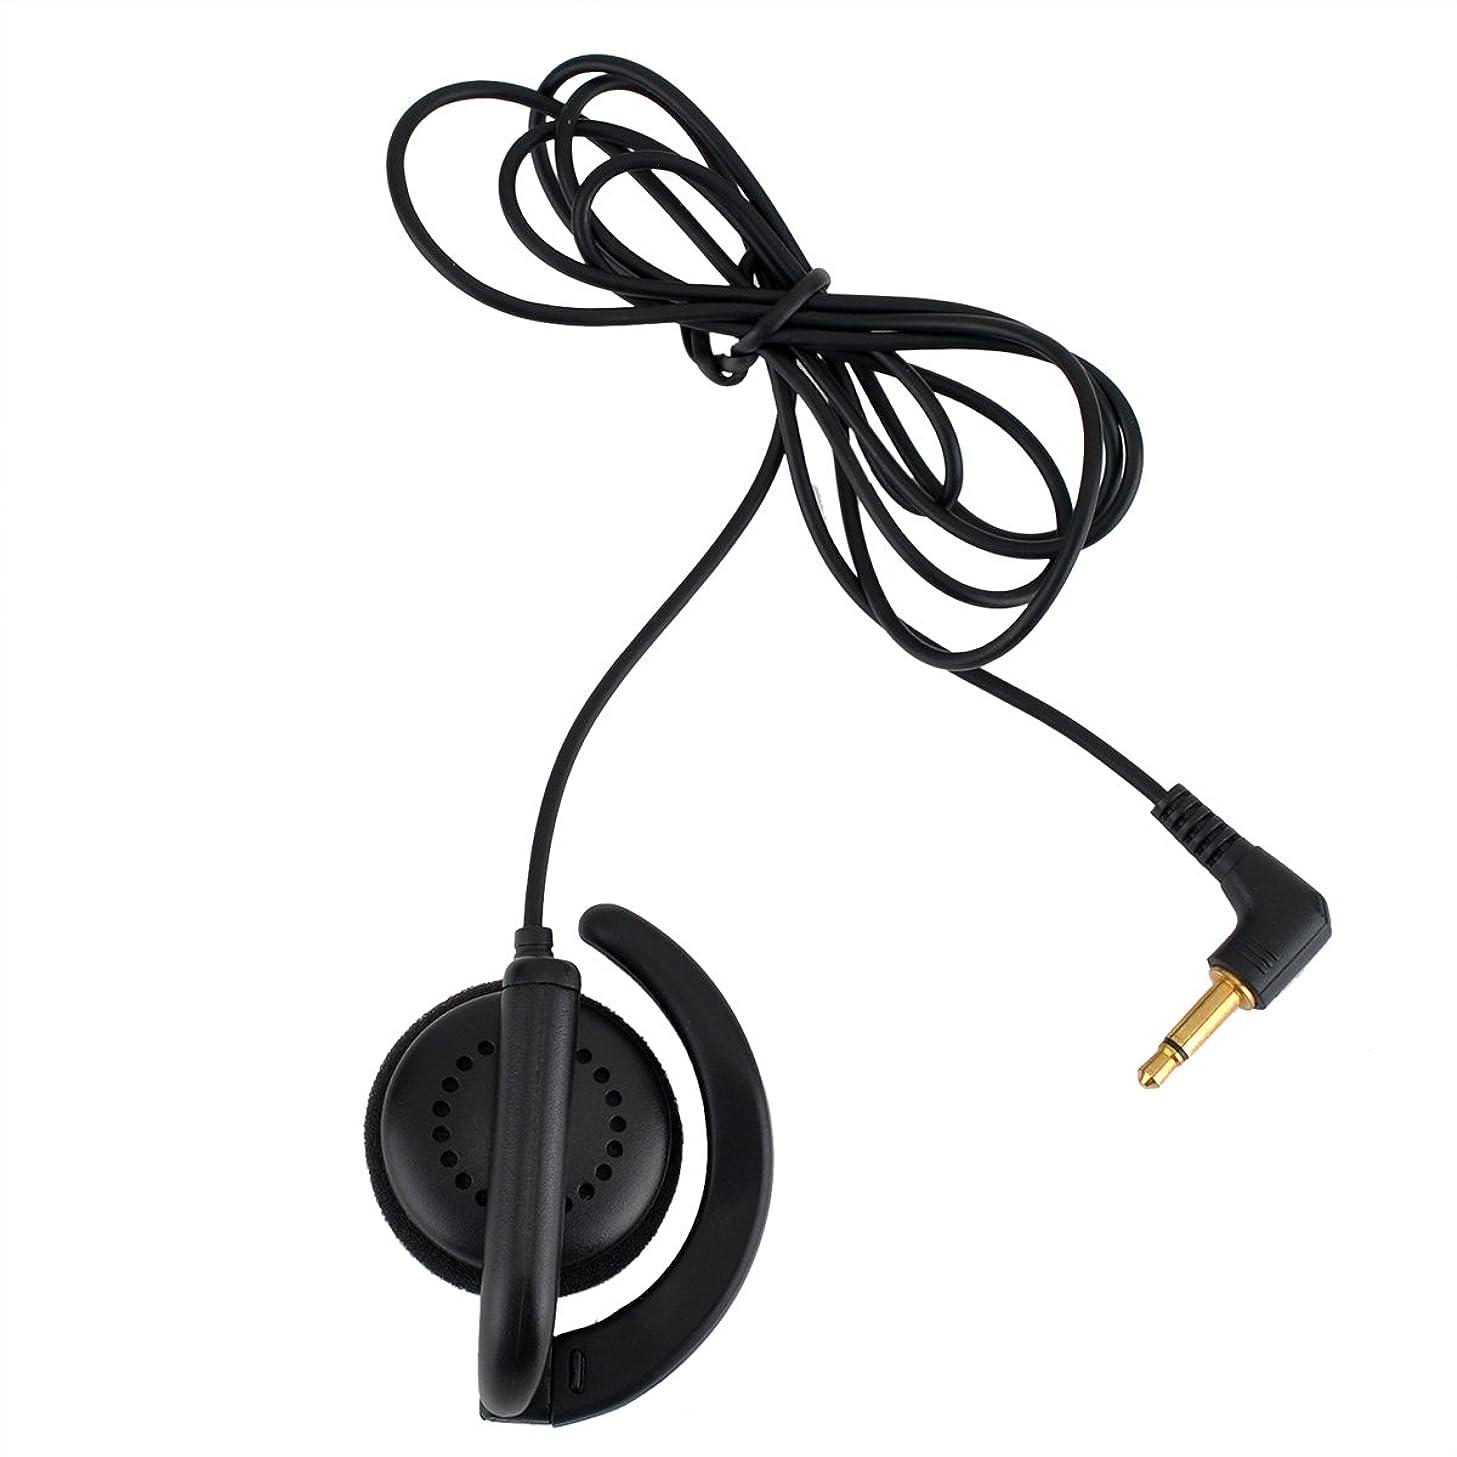 KEYBLU Listen Only Earpiece 1 Pin 3.5mm Receiver/Surveillance Headset Earpiece for Two-Way Radios